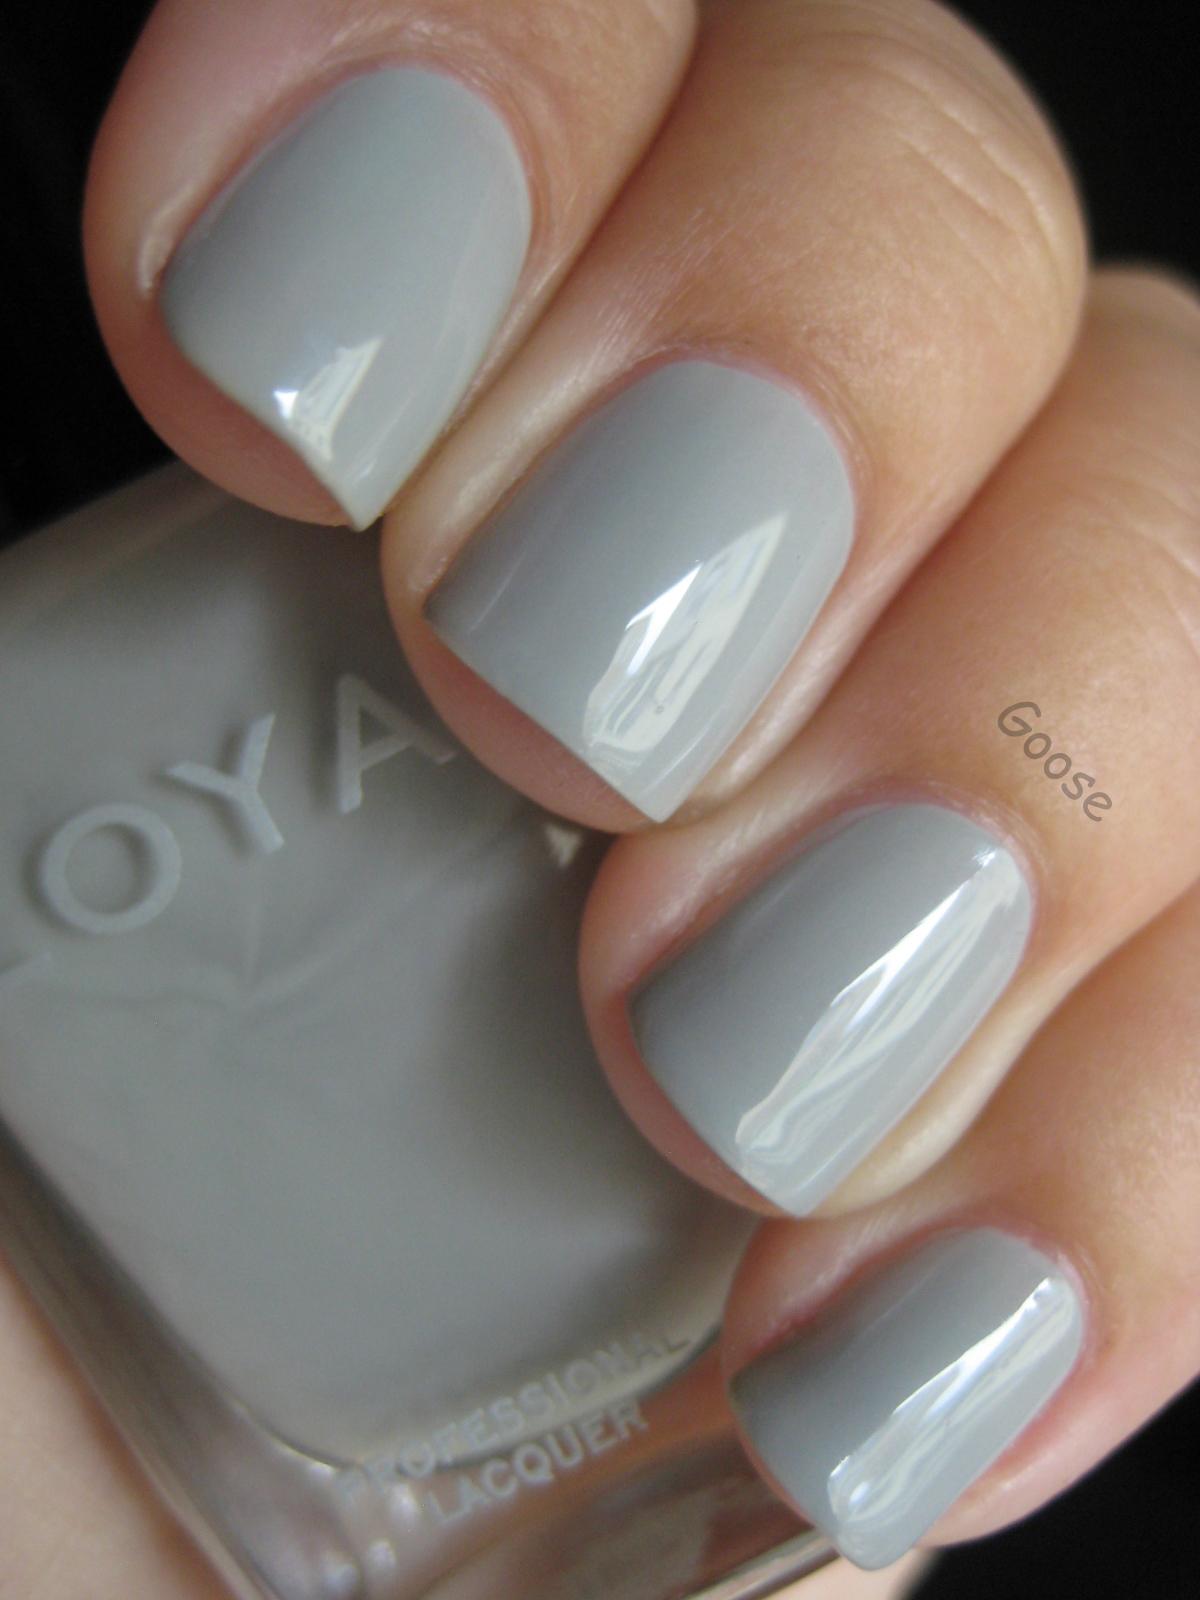 Goose\'s Glitter: Perfect Rainy-Day Grey: Zoya Dove